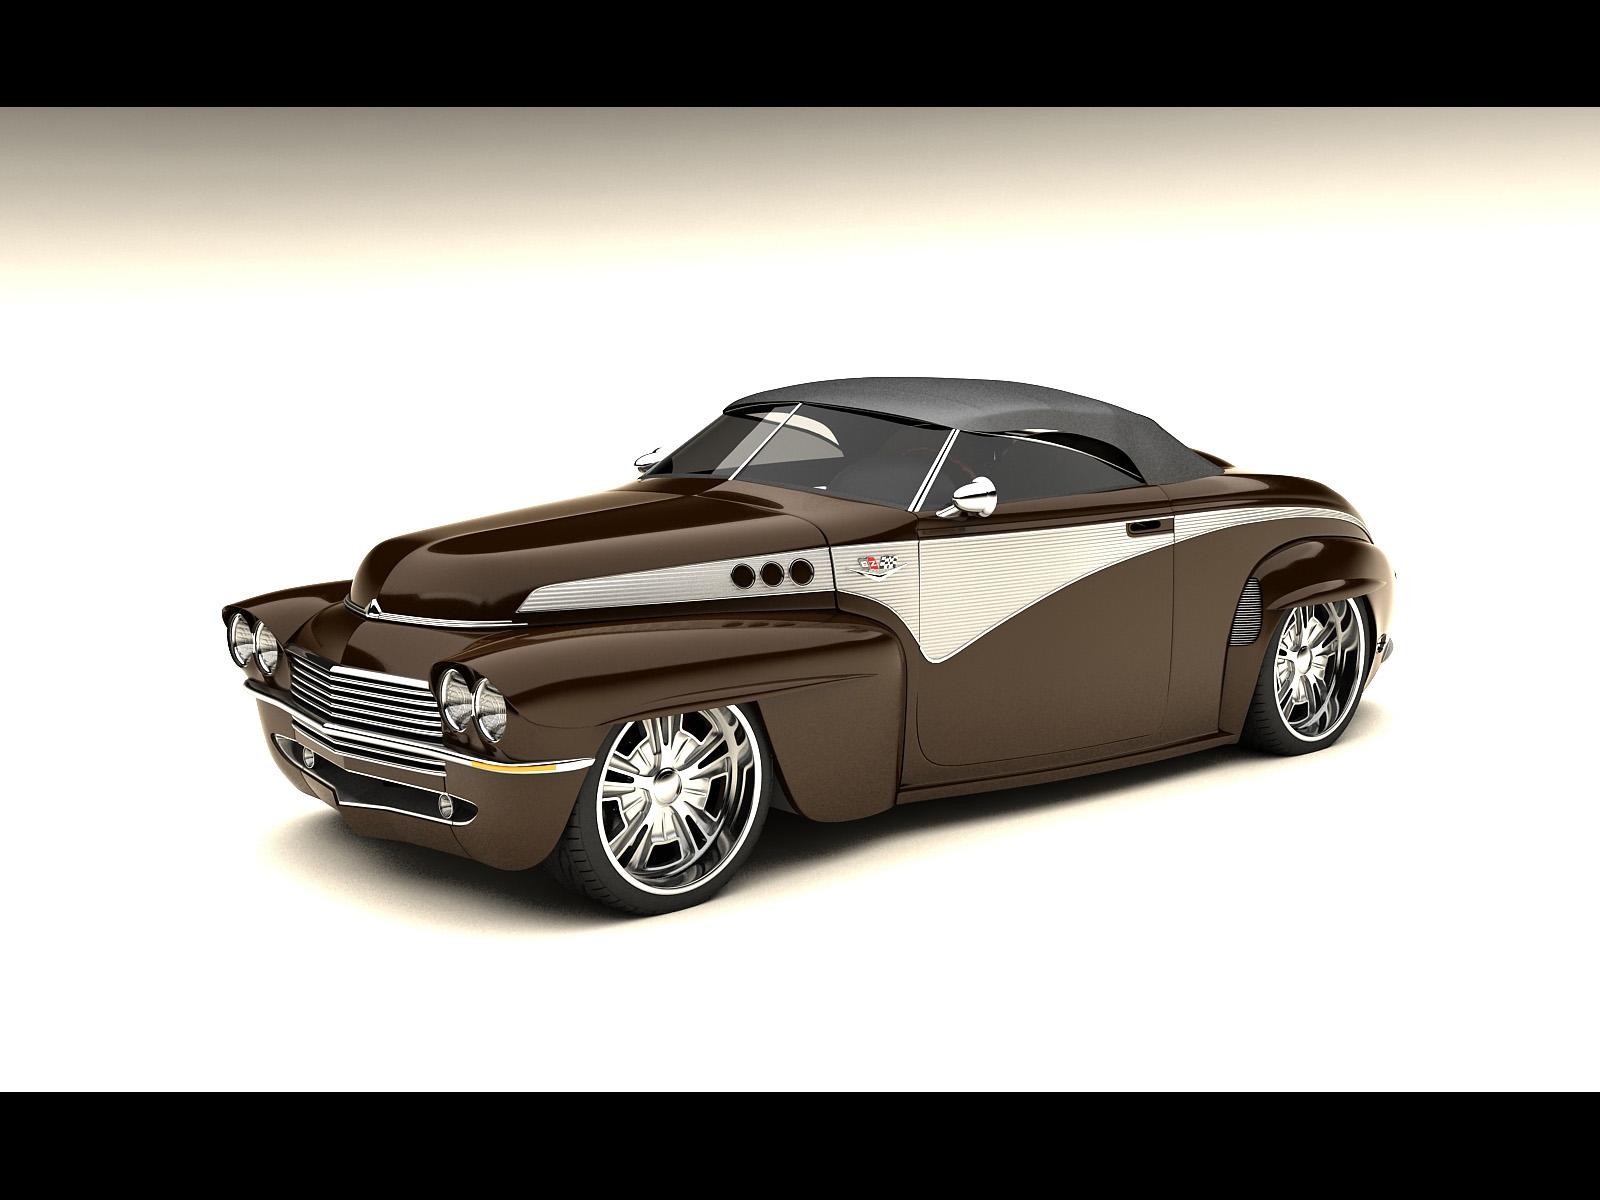 http://4.bp.blogspot.com/-LyLUJP-vV54/TWZQOXvfGsI/AAAAAAAAAW0/hW7Ksx5OQ-c/s1600/1956-Volvo-Custom-by-Vizualtech-Brown-1600x1200.jpg